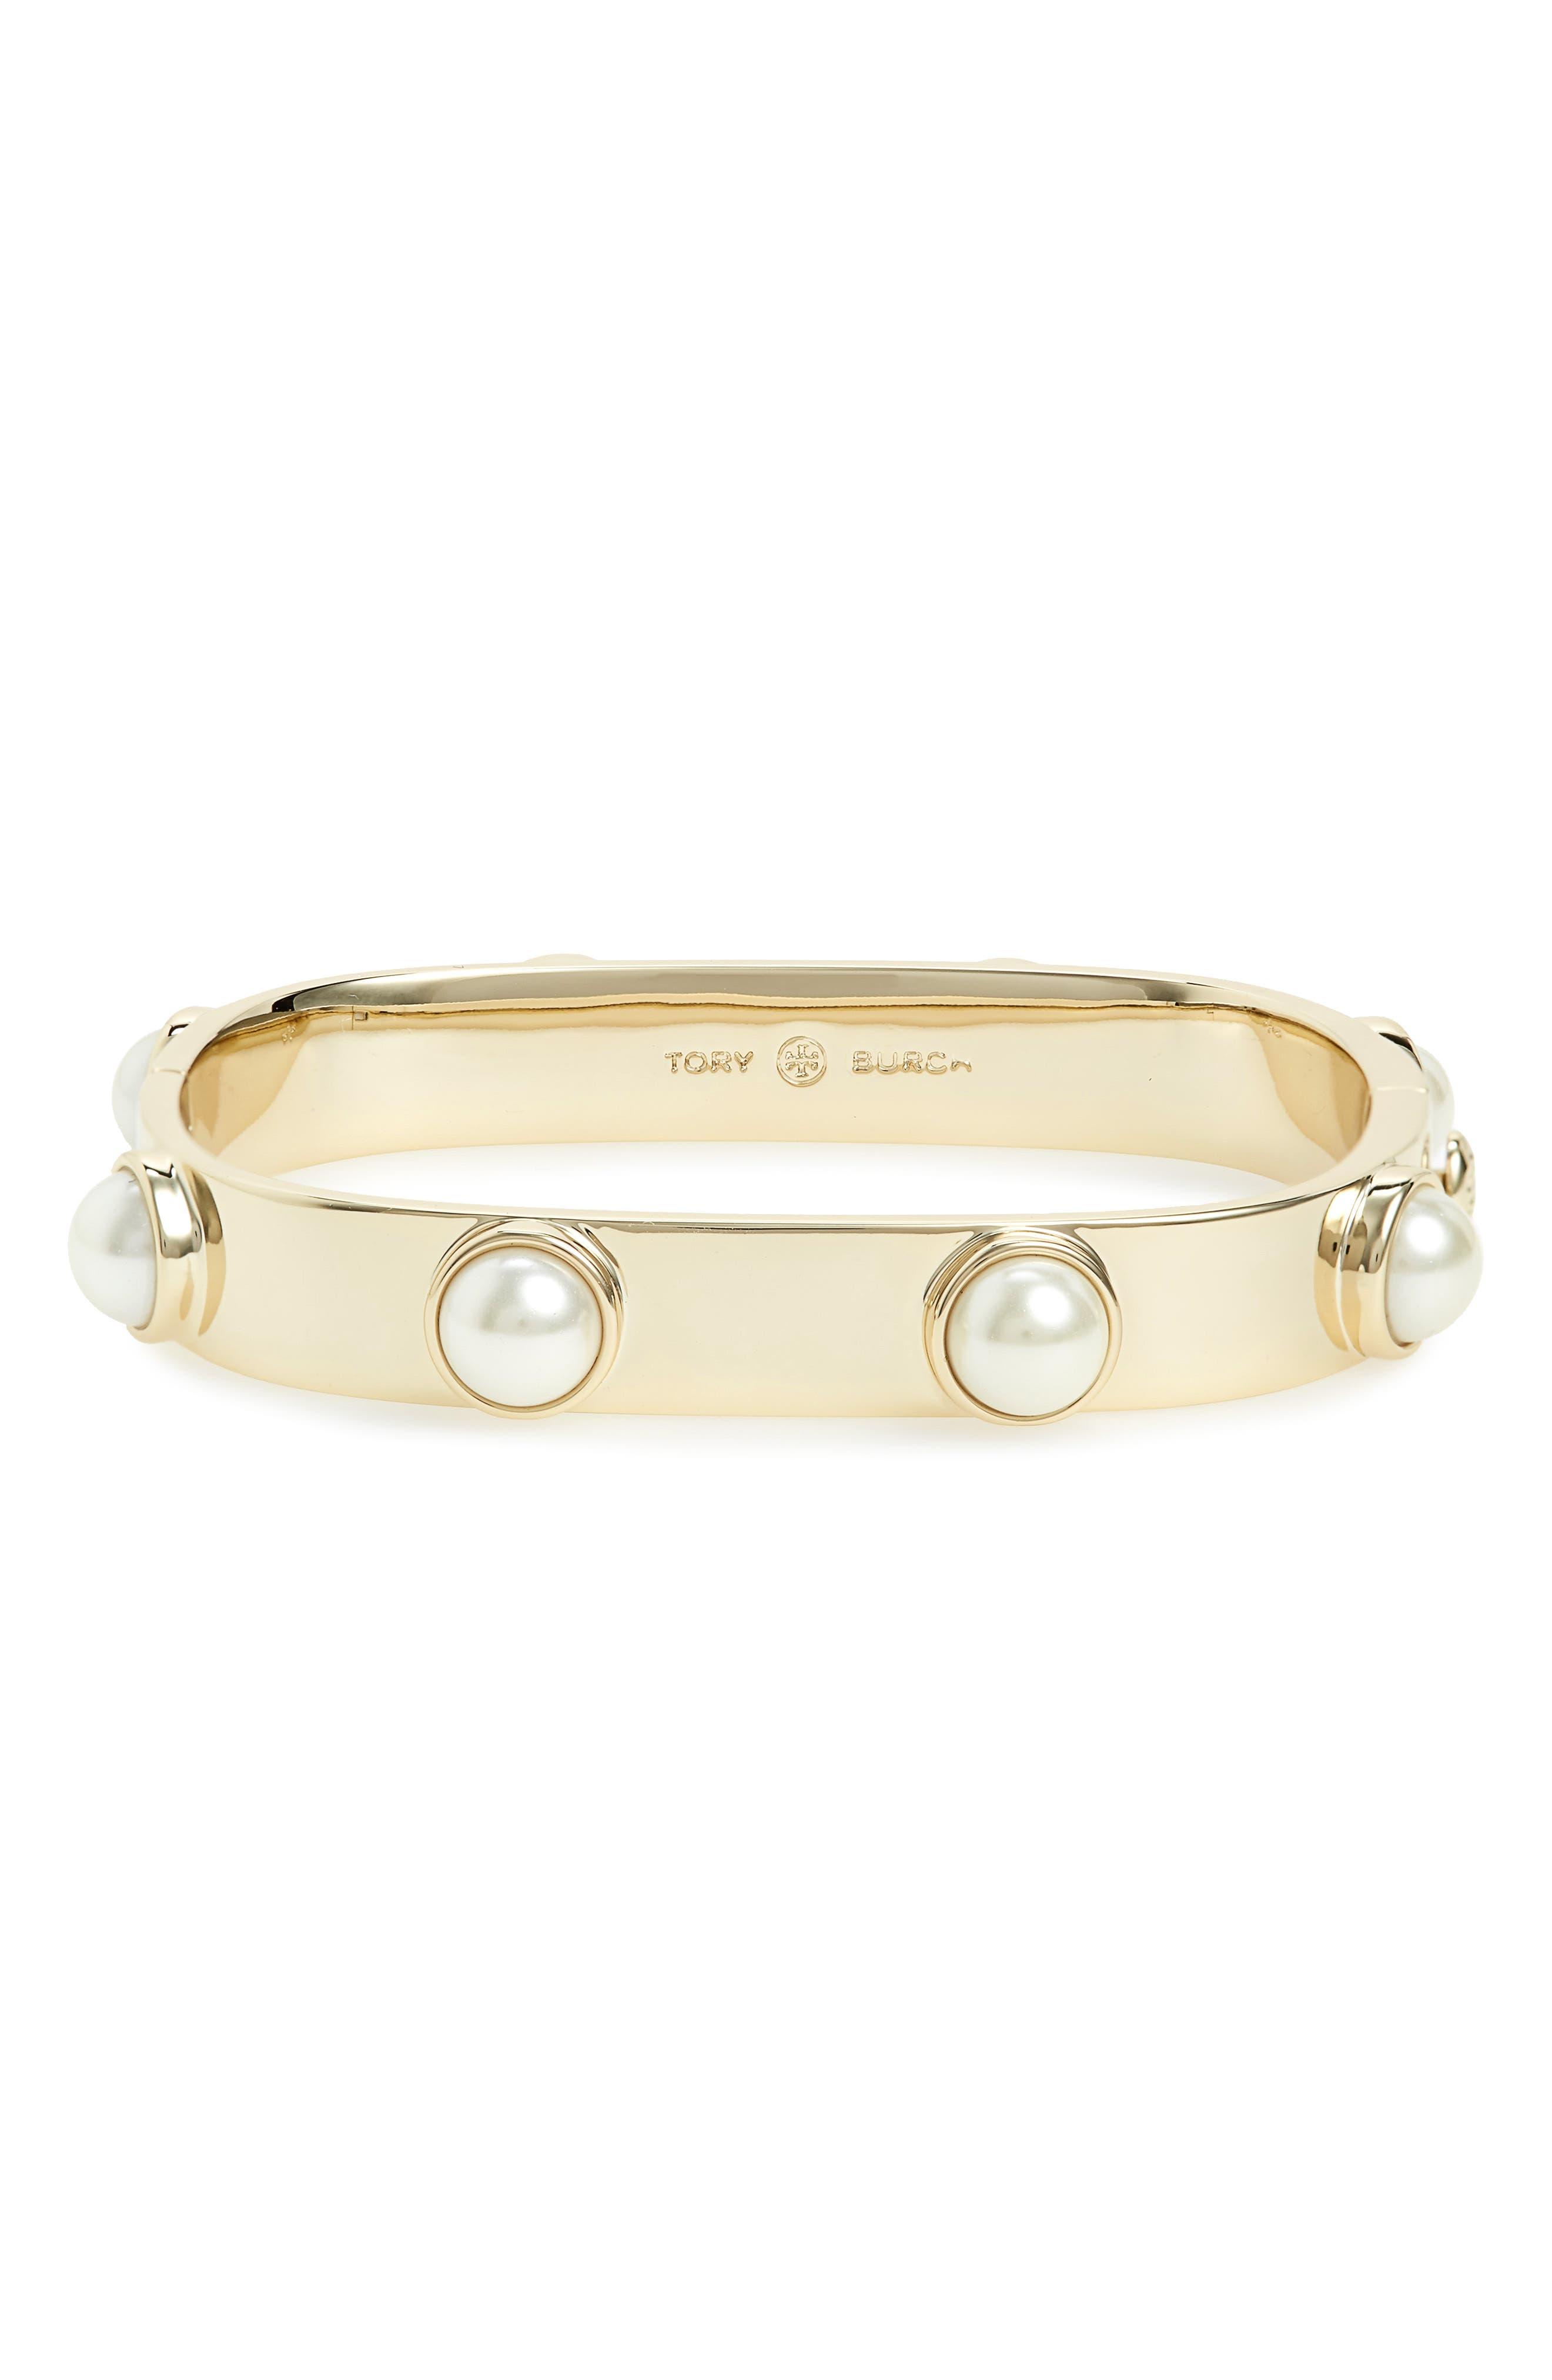 Tory Burch Stacked Studded Imitation Pearl Bracelet